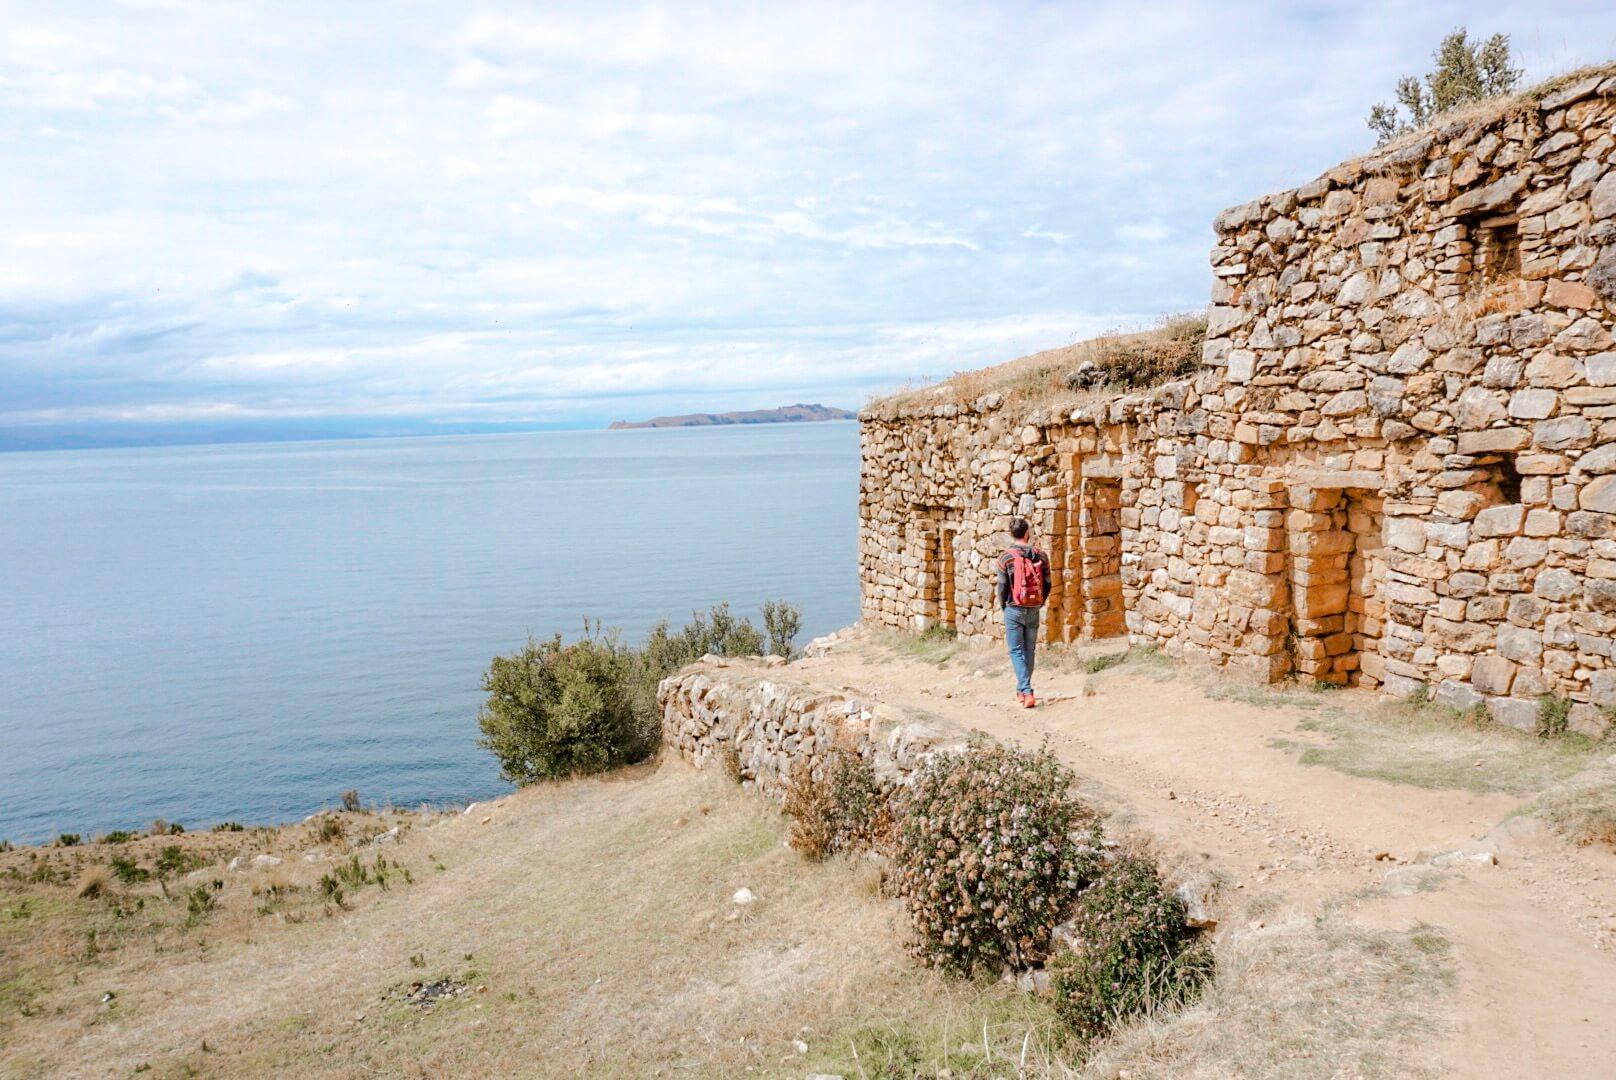 que faire isla del sol lac titicaca copacabana bolivie blog